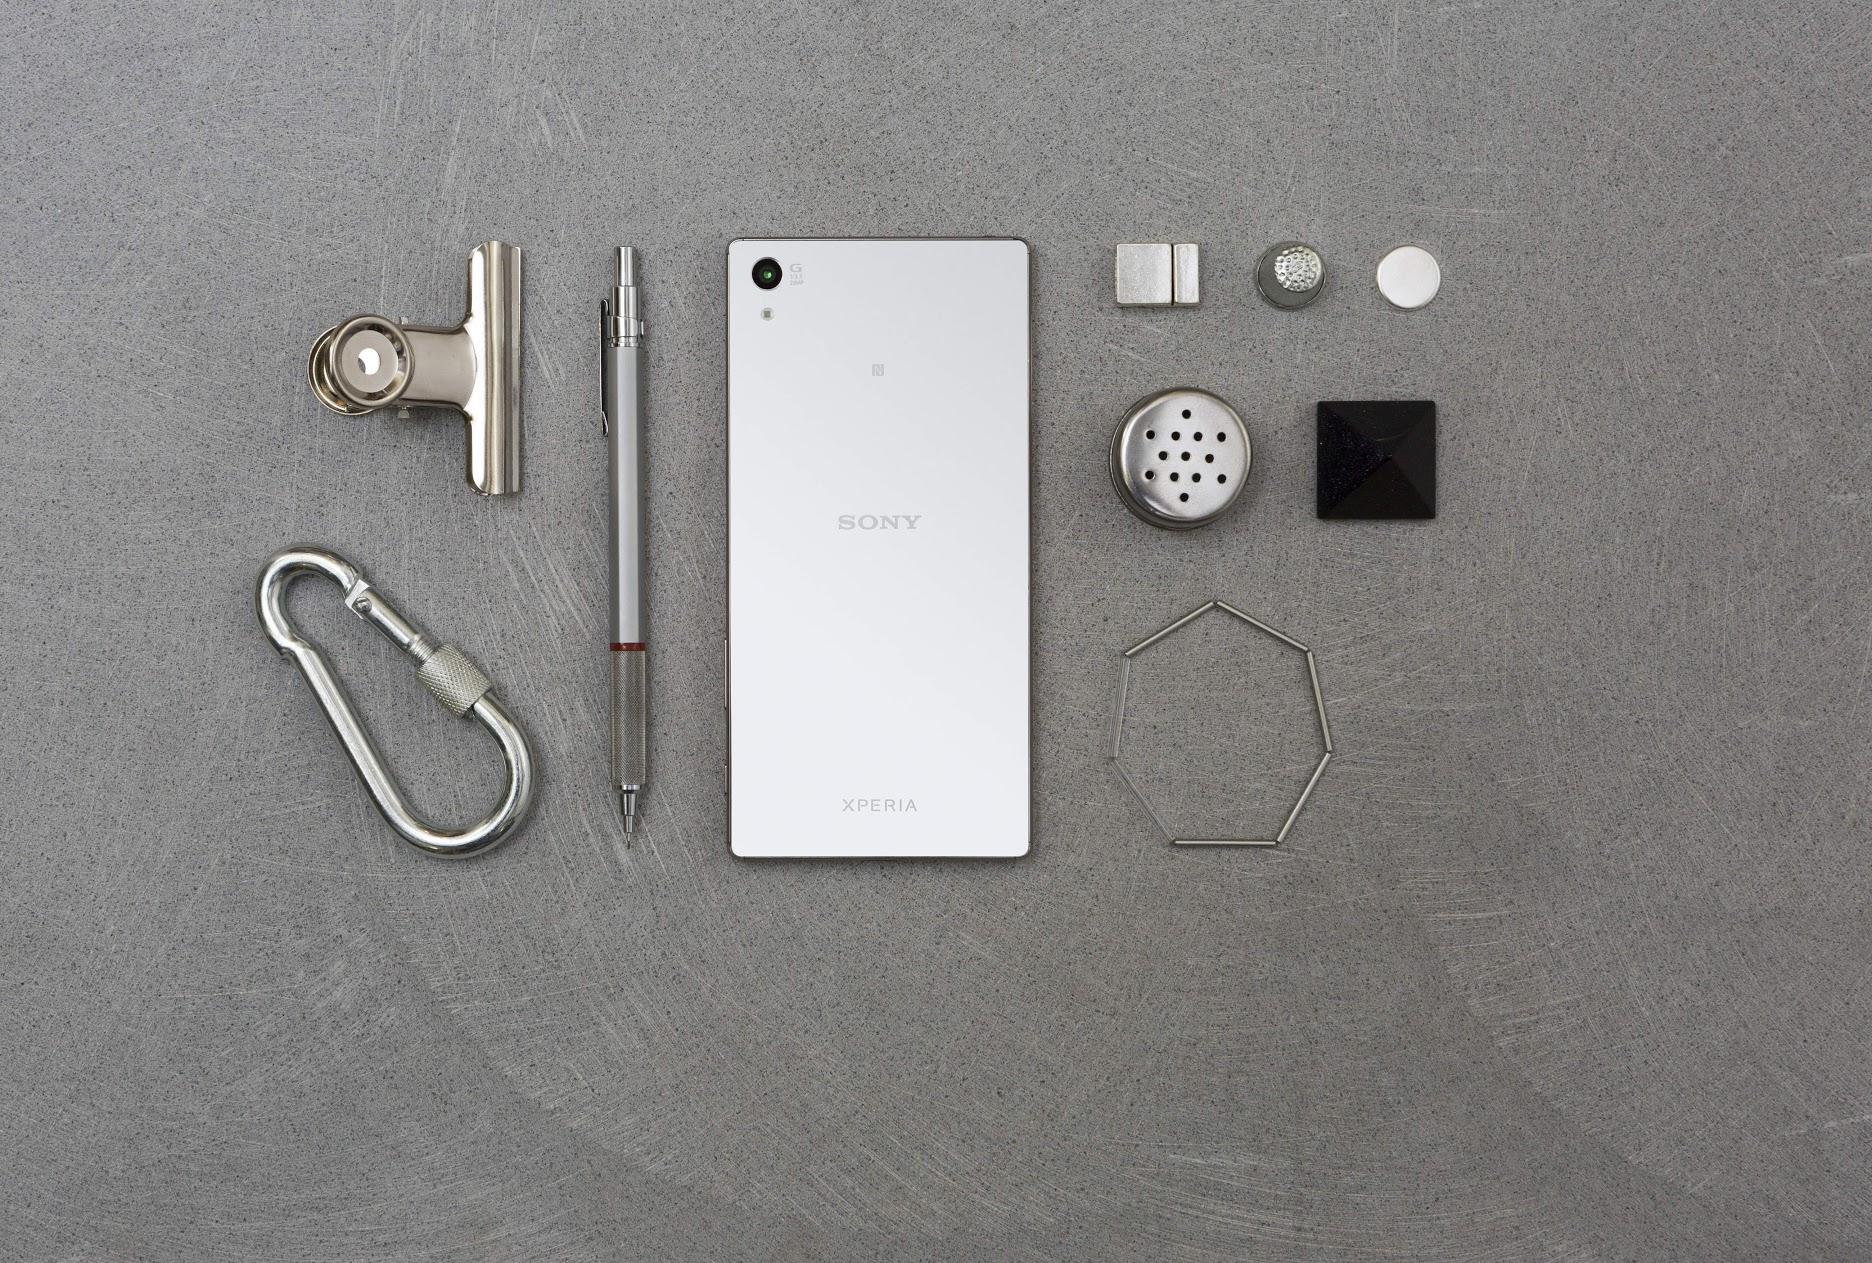 Sony Xperia Z5 Premium retro